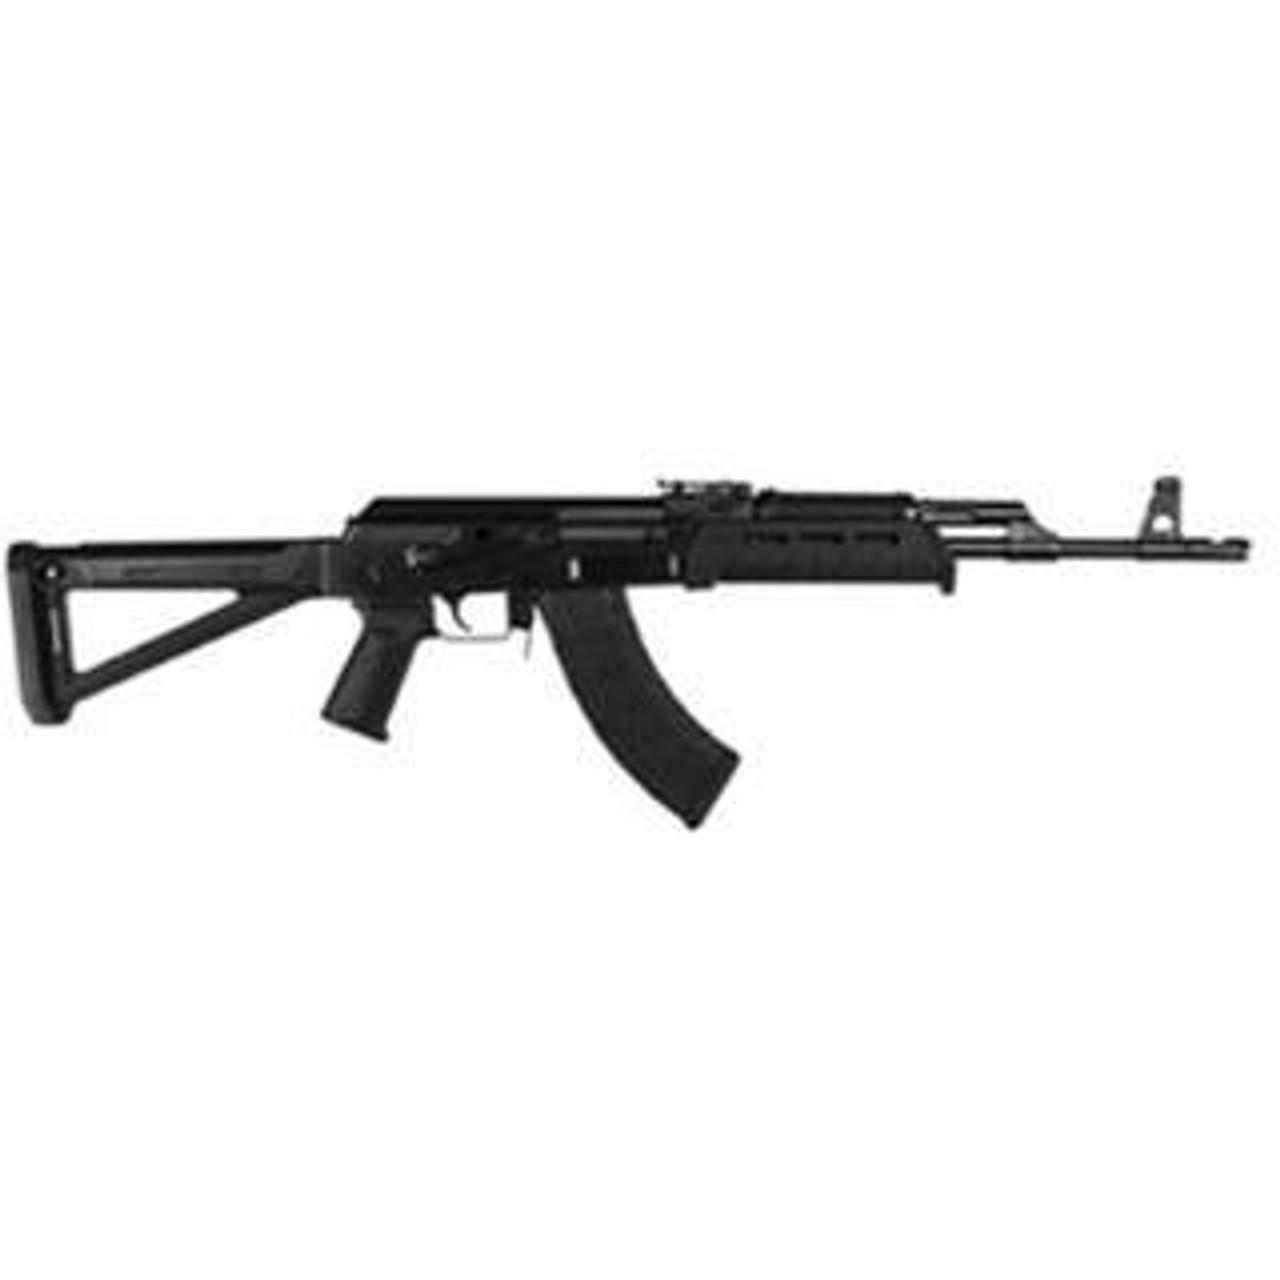 Century Arms C39v2 MOE MAGPUL CALIFORNIA LEGAL-7.62x39